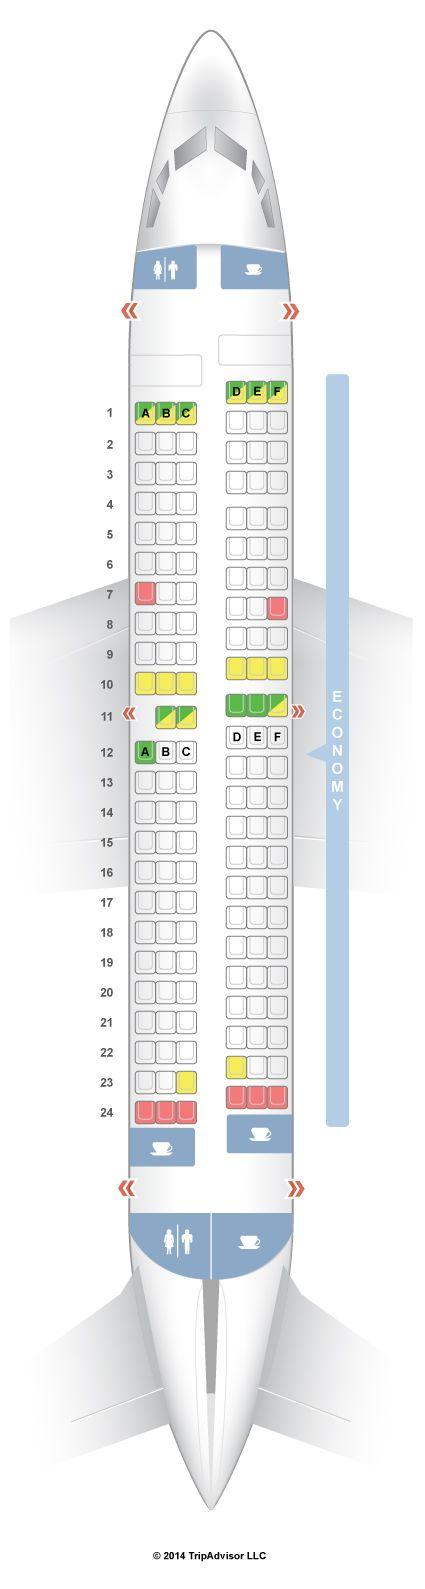 Seatguru Seat Map Southwest Boeing 737 700 737 Seatguru Travel